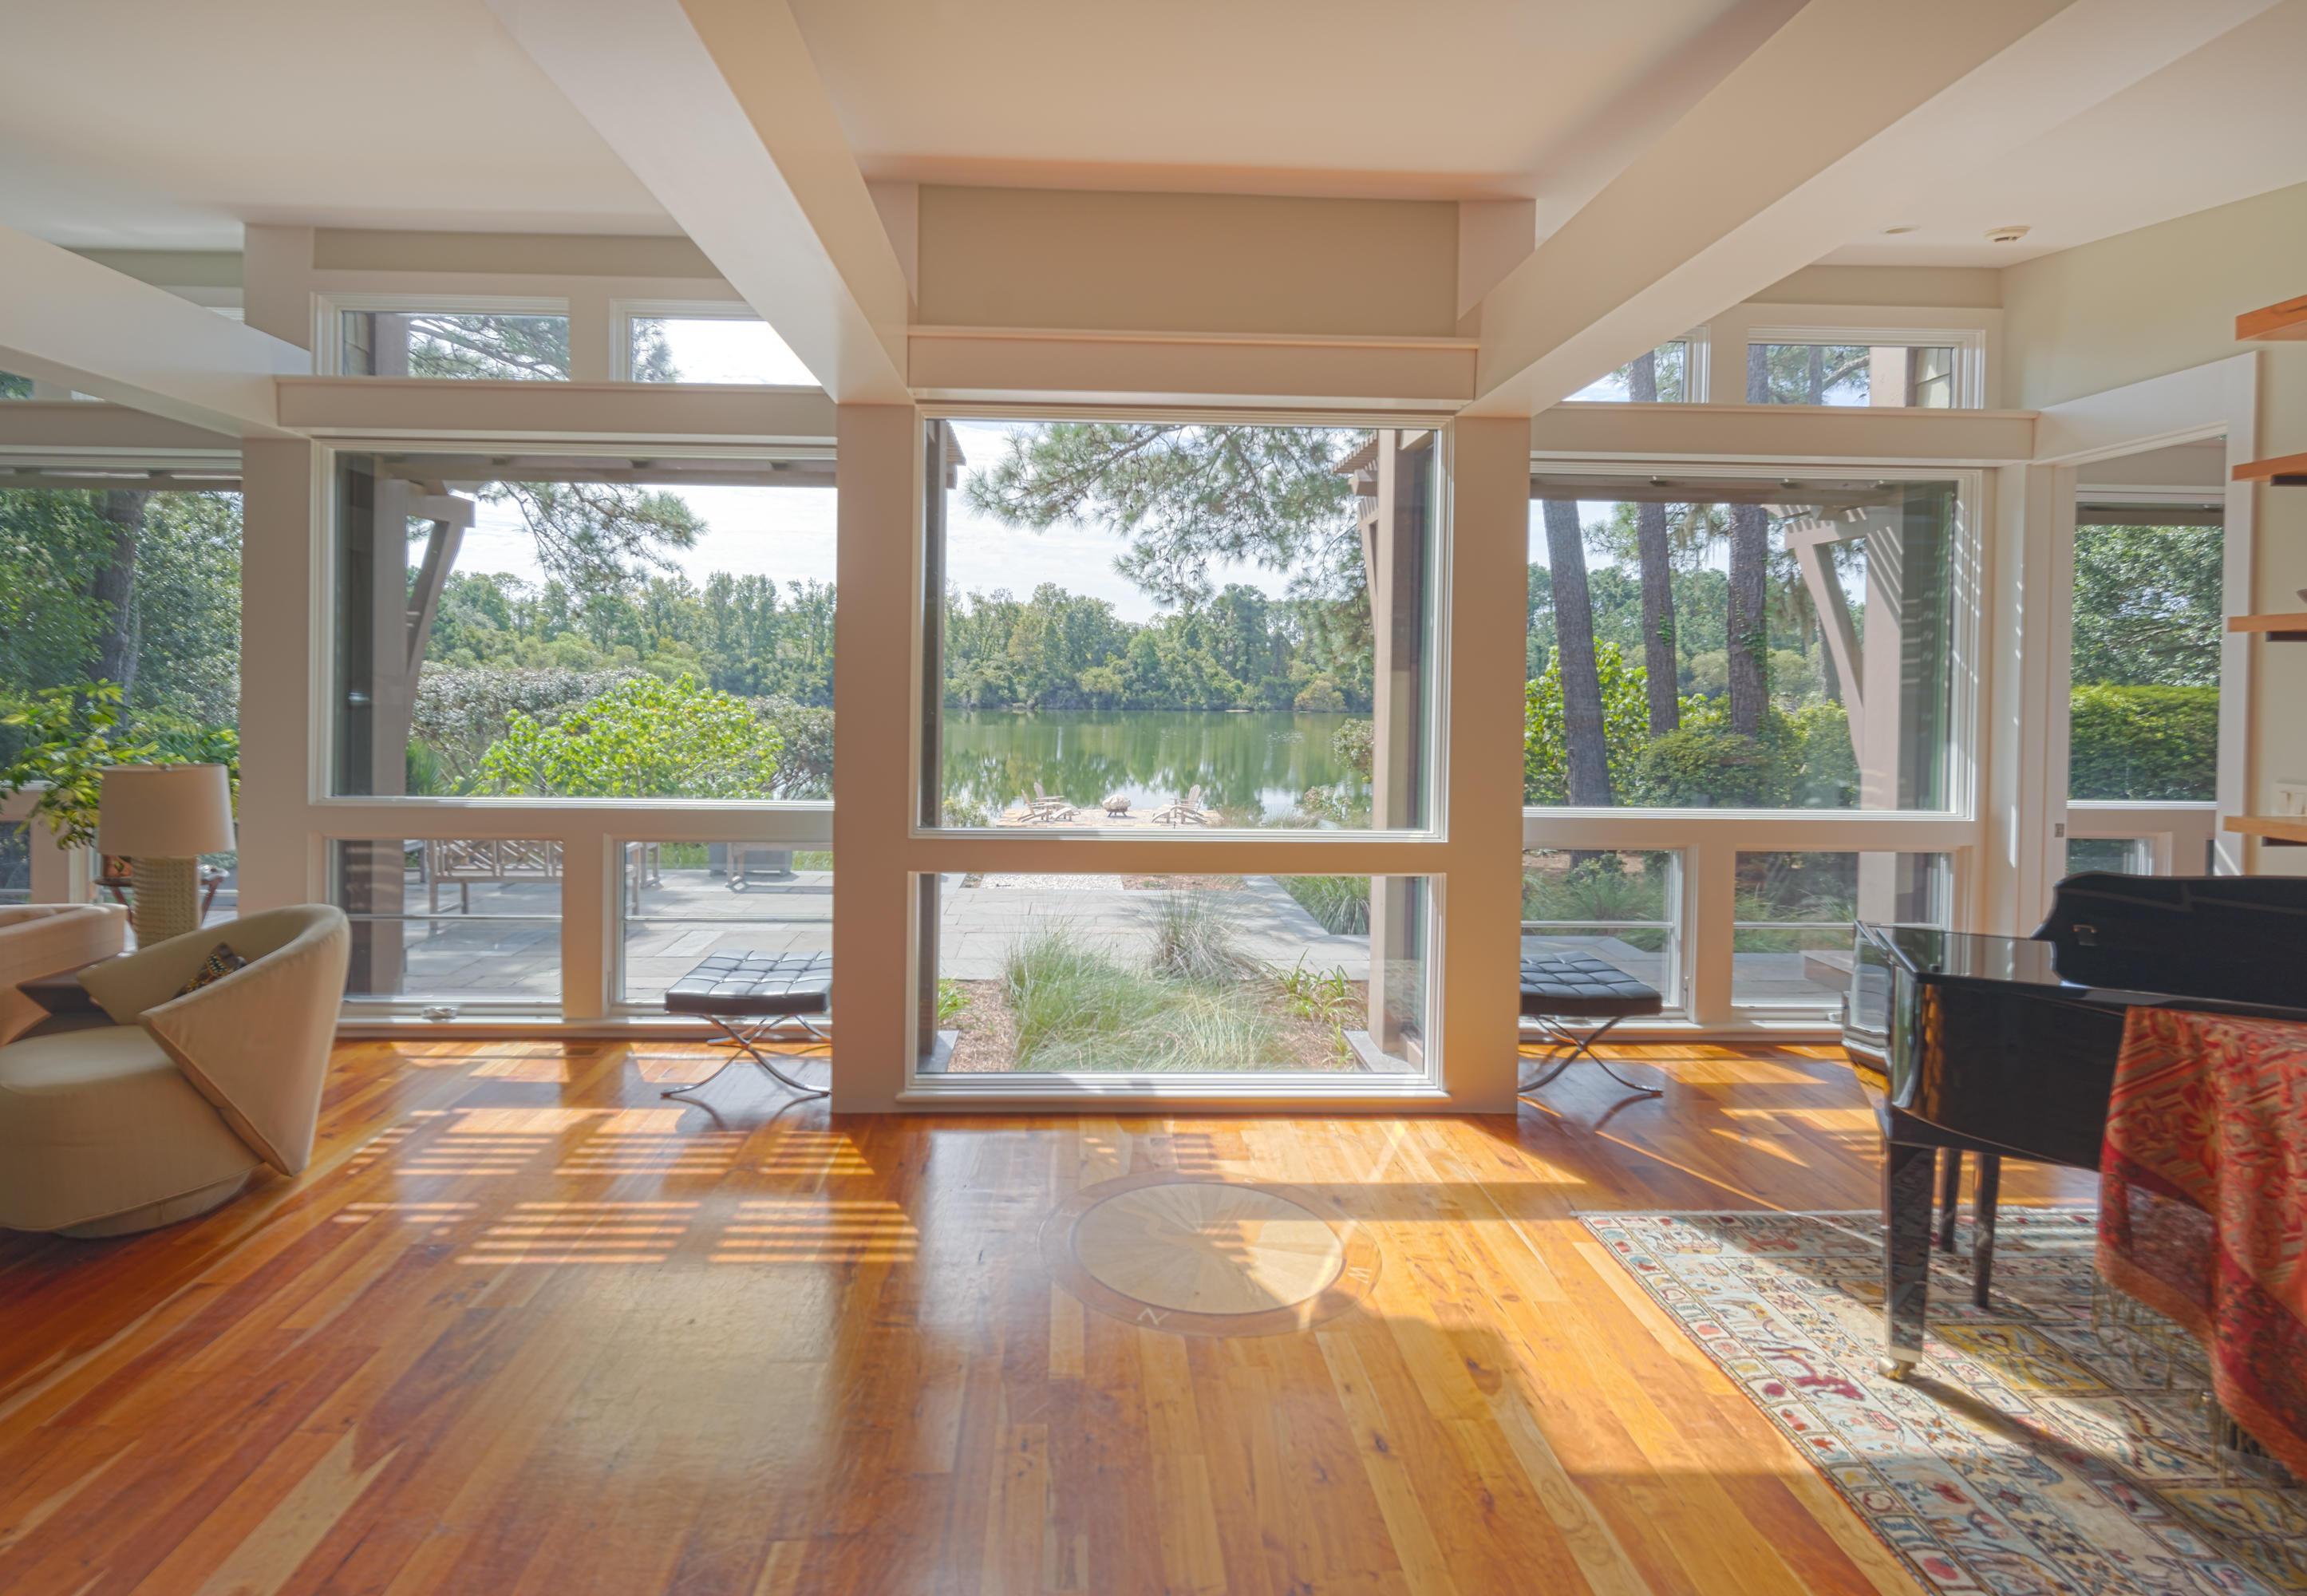 Briars Creek Homes For Sale - 4249 Wild Turkey, Johns Island, SC - 57